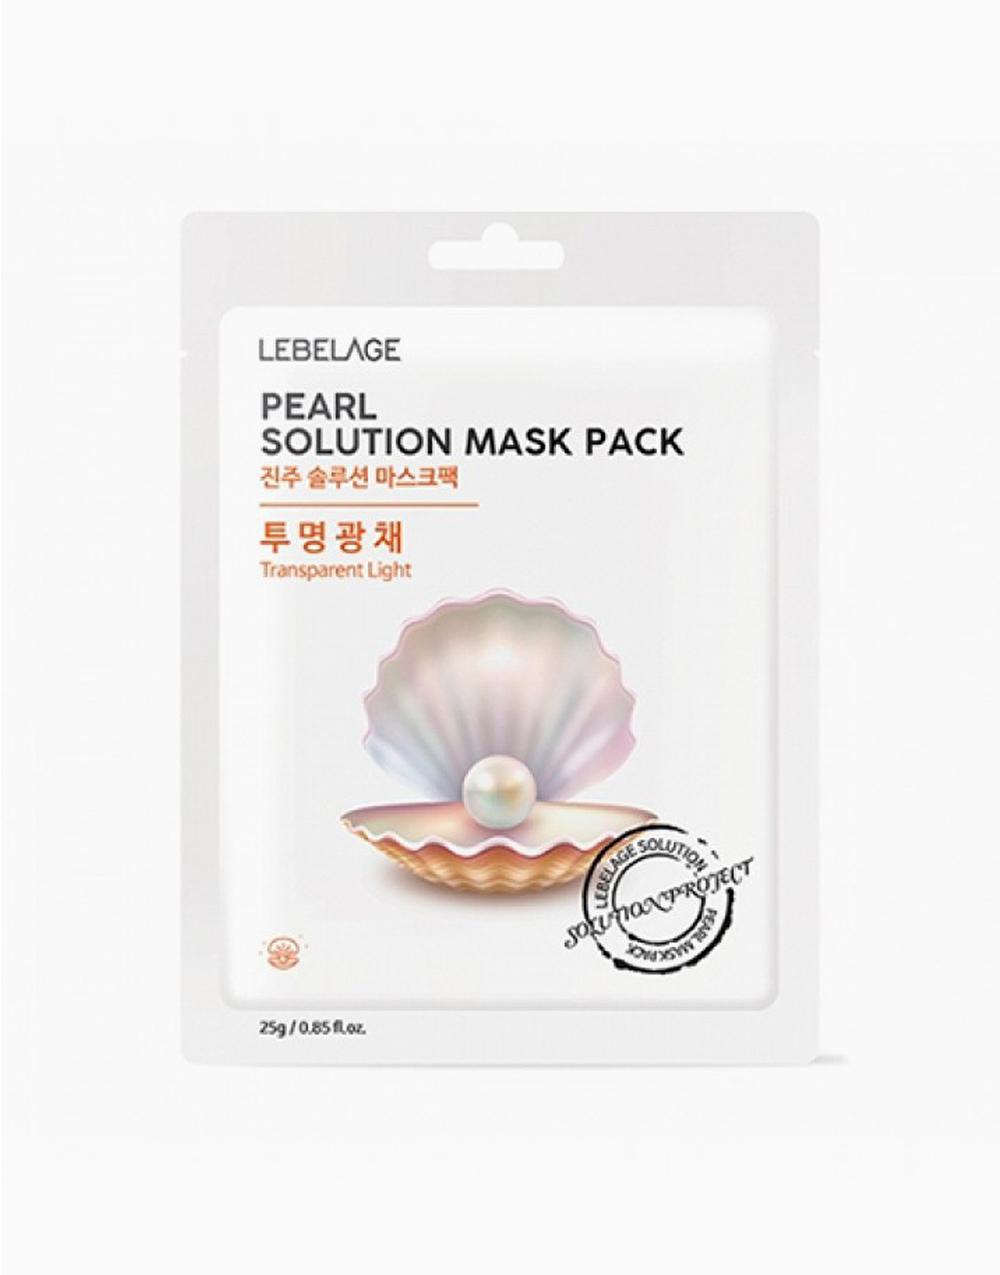 Pearl Mask Sheet by Lebelage